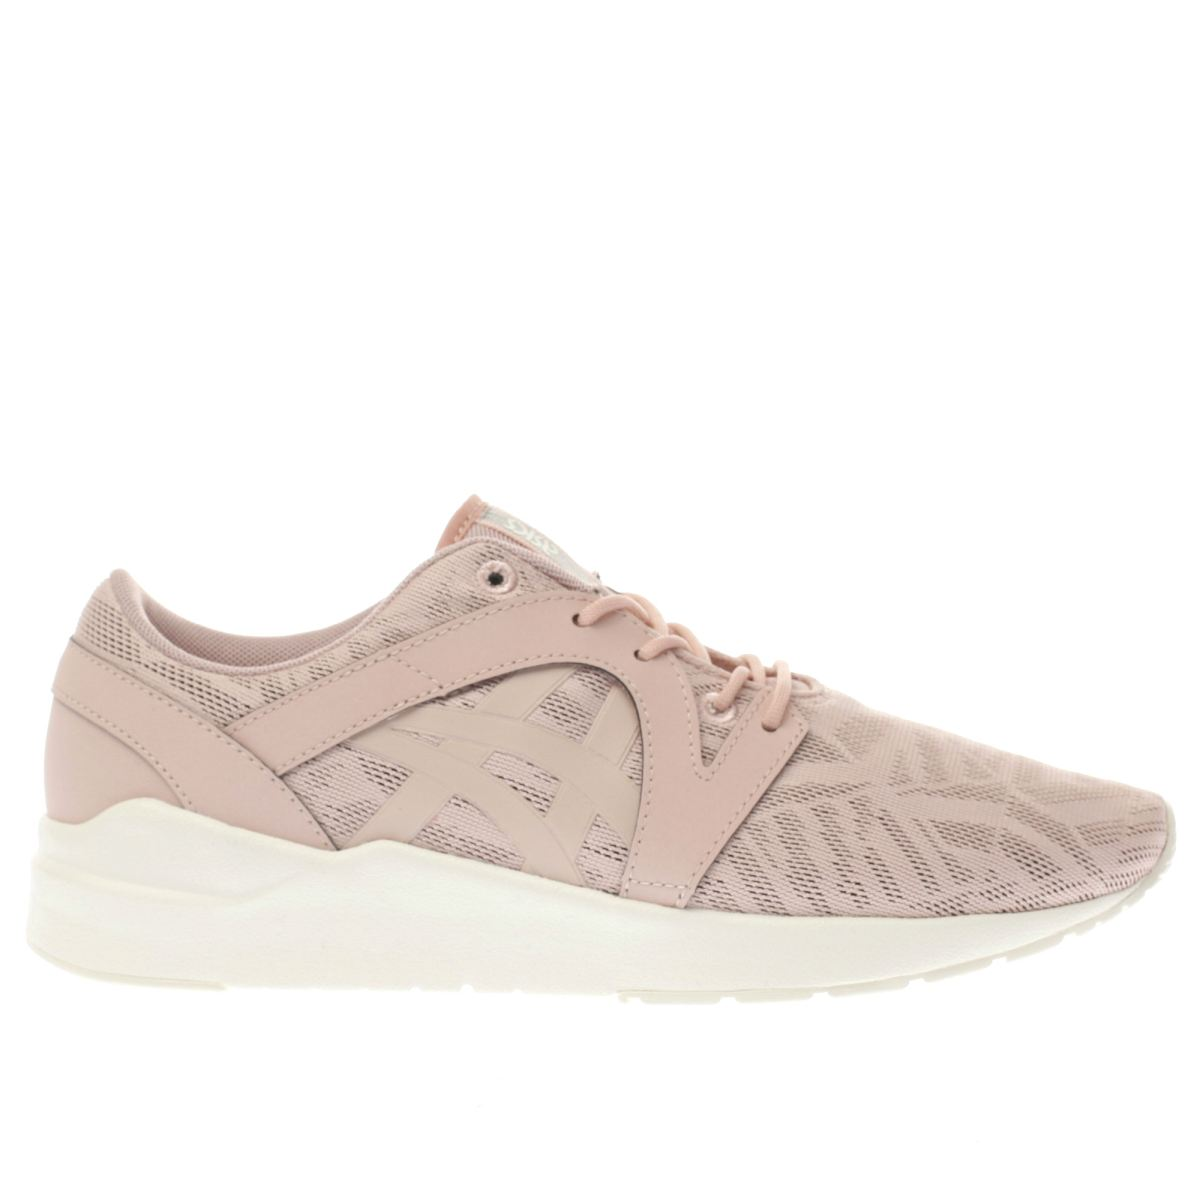 asics pale pink gel-lyte komachi trainers